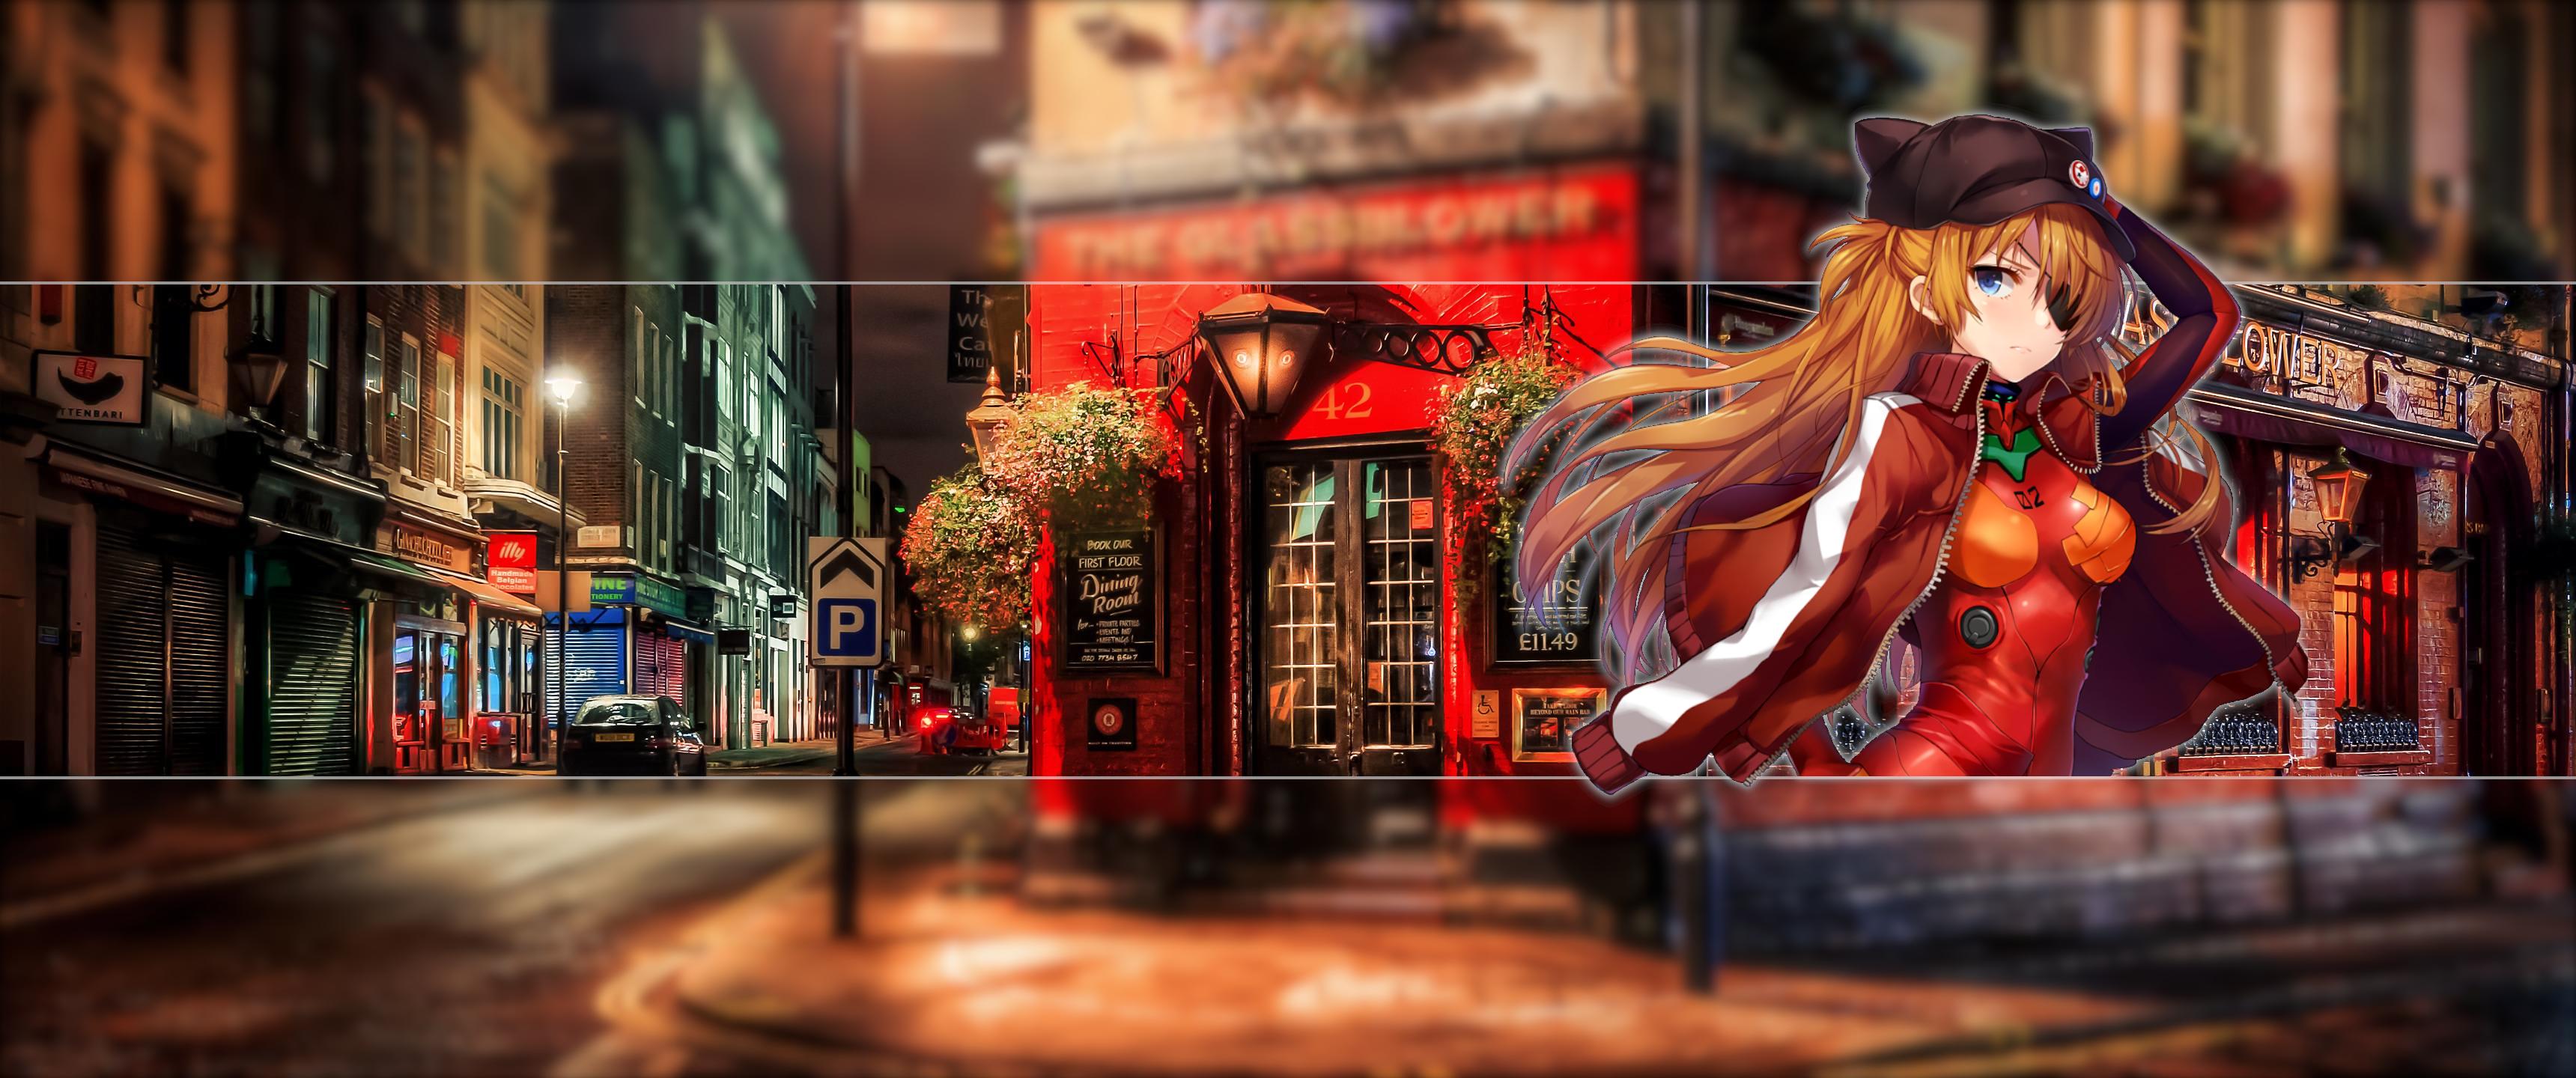 Anime Polyscapes Wallpaper 3440 X 1440 Wallpaper Anime 3440x1440 Download Hd Wallpaper Wallpapertip